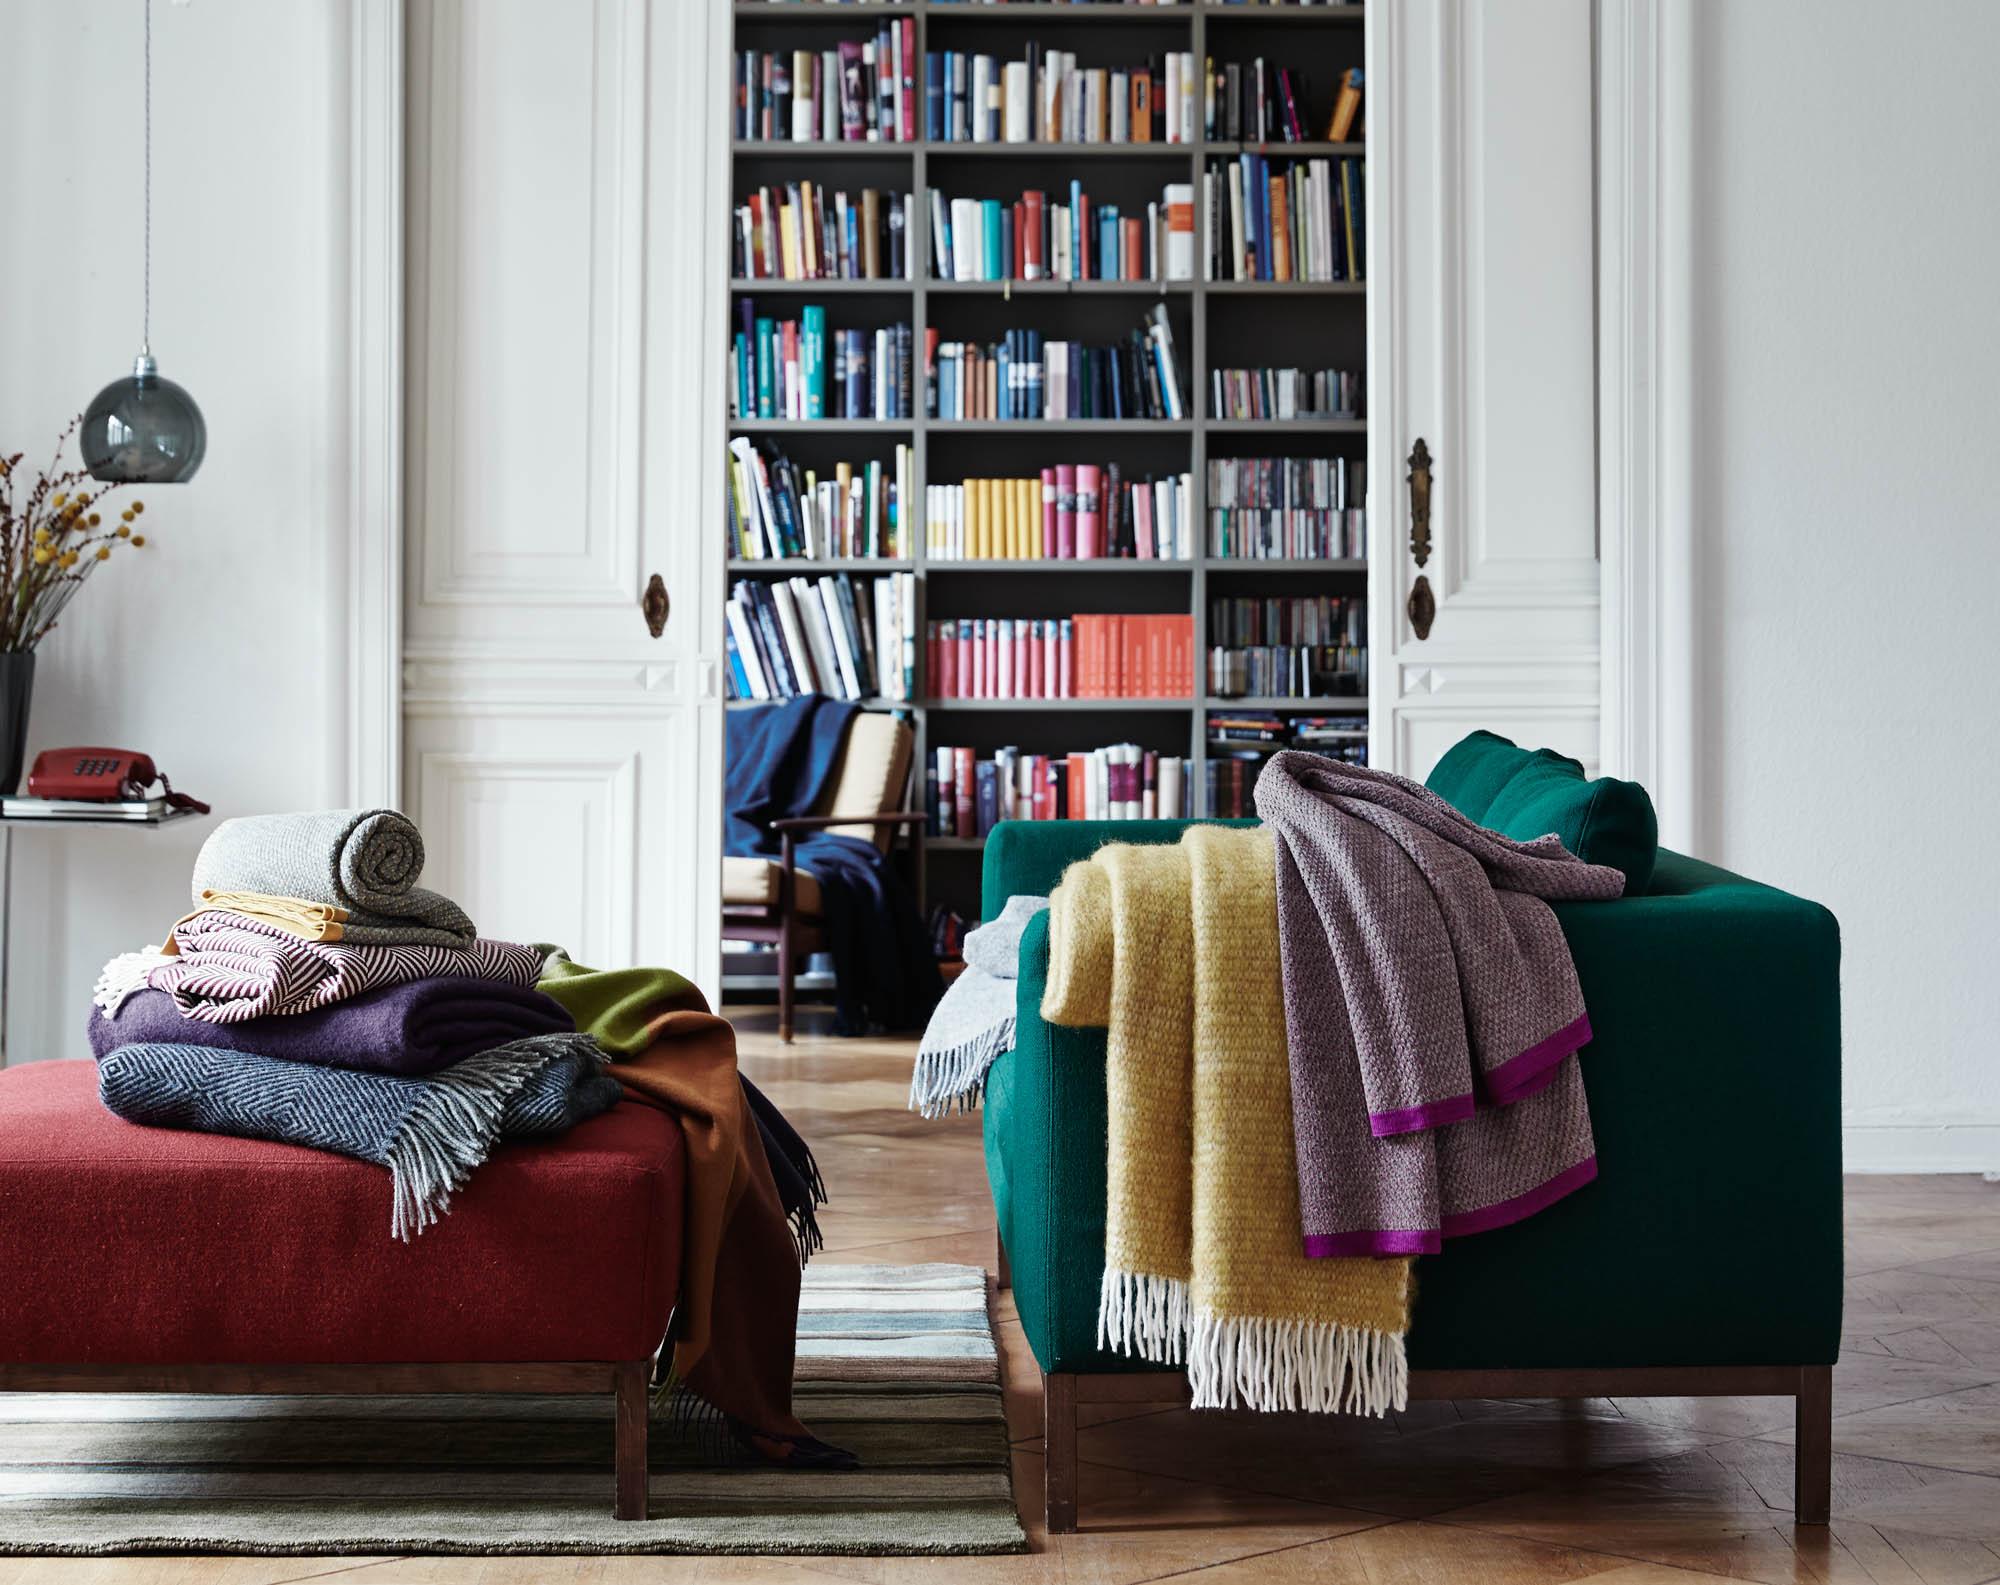 Living blankets 25.09.14 0193_RGB.jpg